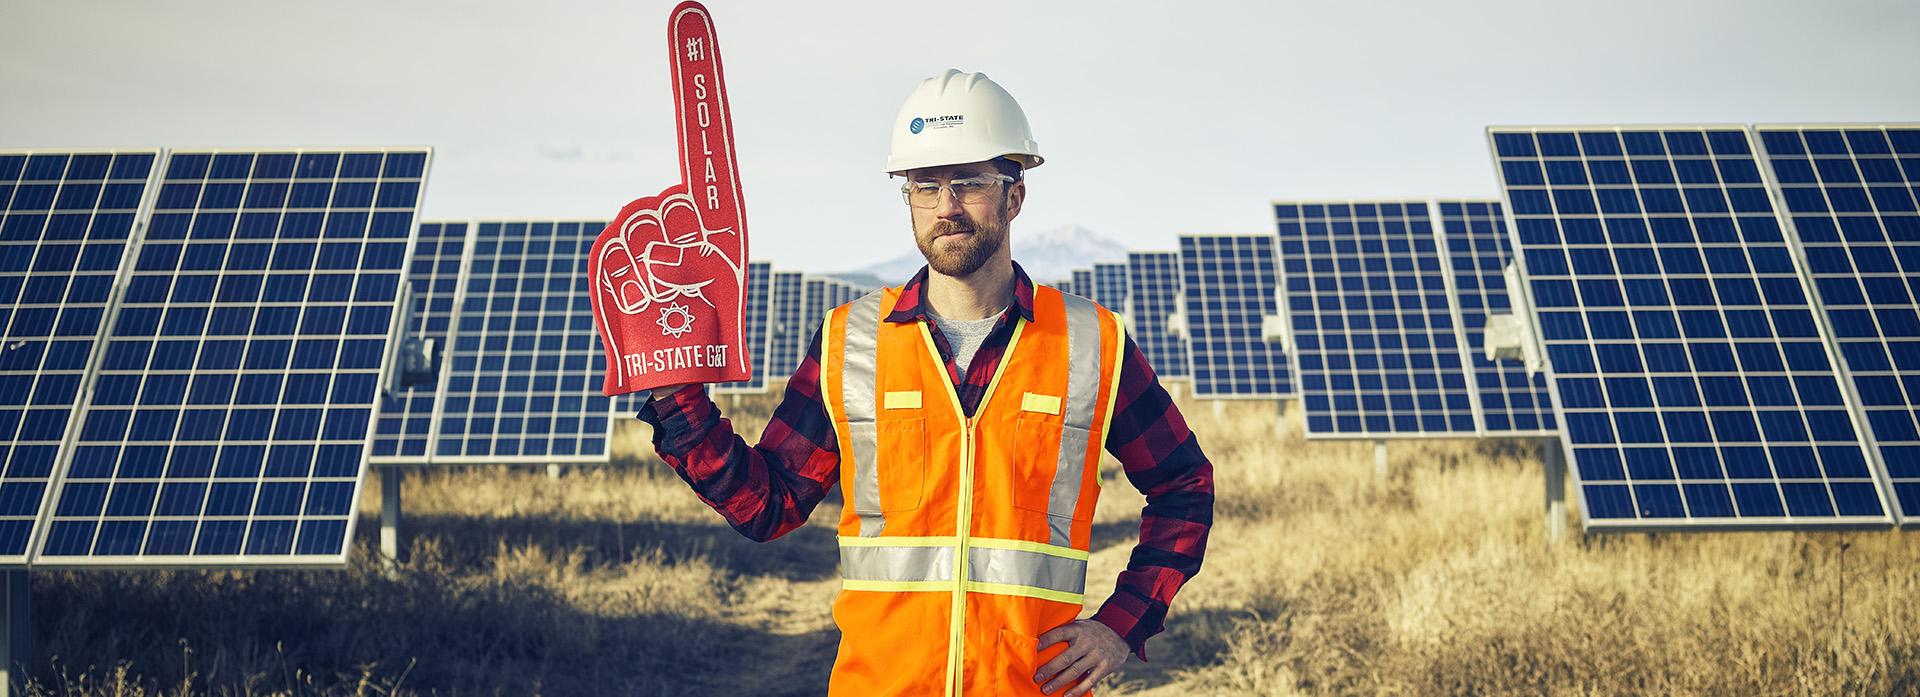 https://www.tristategt.org/sites/tristate/files/revslider/image/Randy-solar-hero-030819.jpg